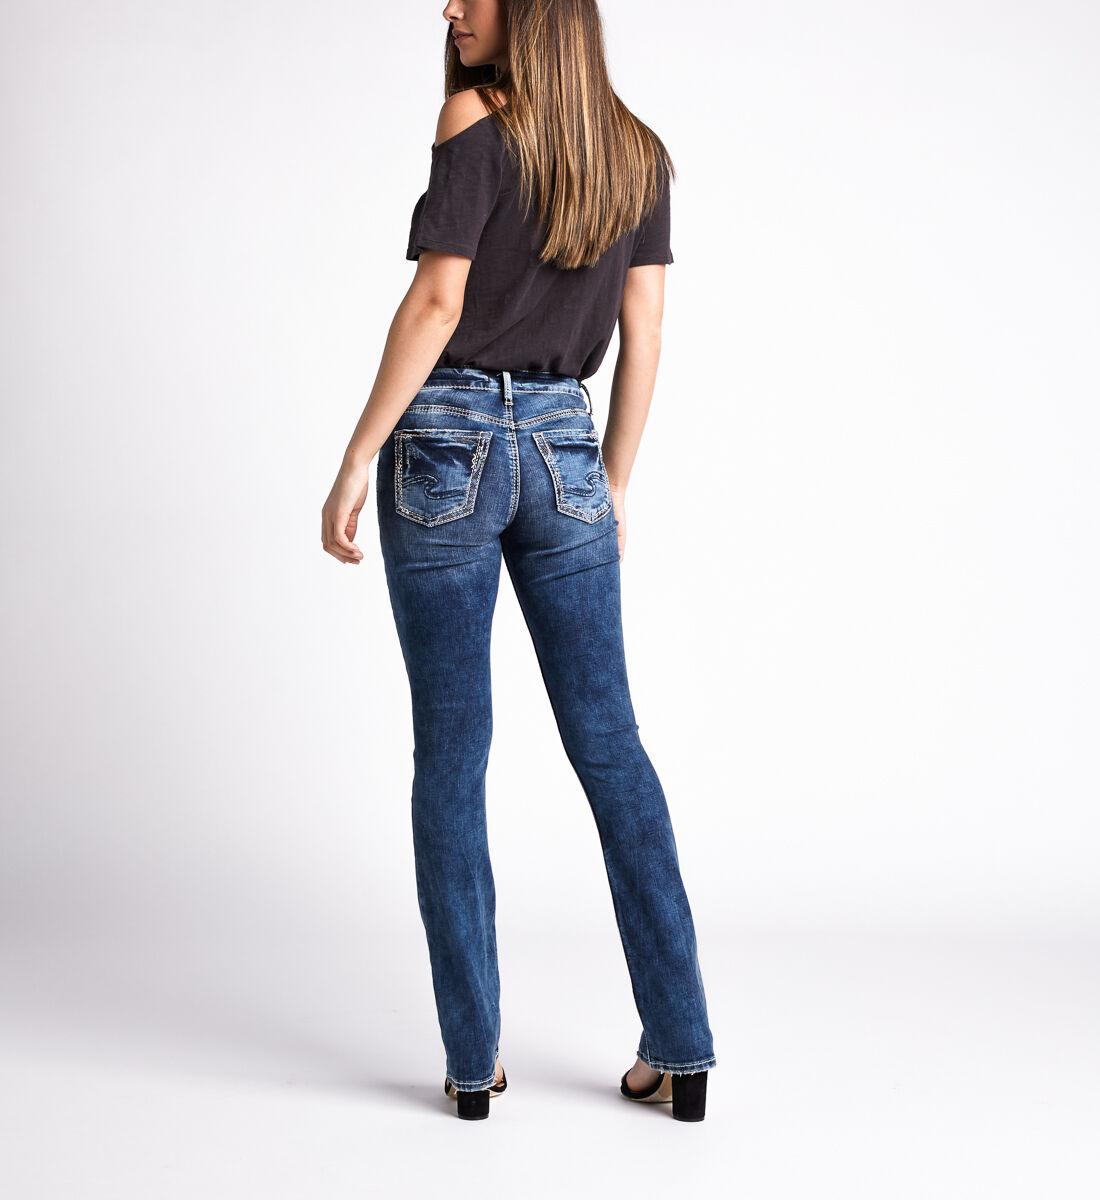 Avery High Rise Slim Bootcut Jeans,Indigo Back